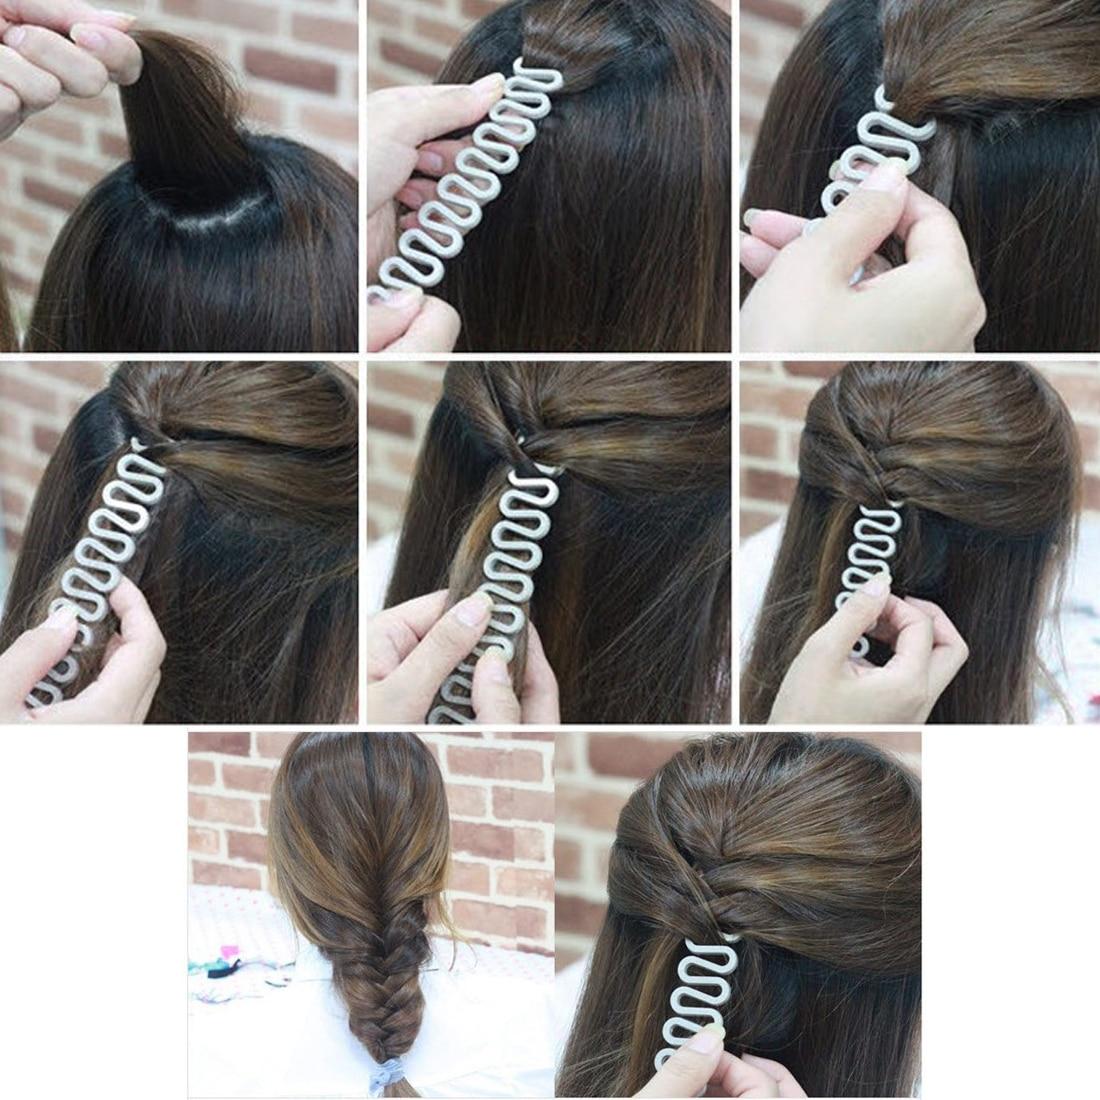 Weave Roller Band  Hair Braiding Tool Fish Bone Braider Roller Twist Styling Bun Maker /Hair Styling Hairdressing Tools